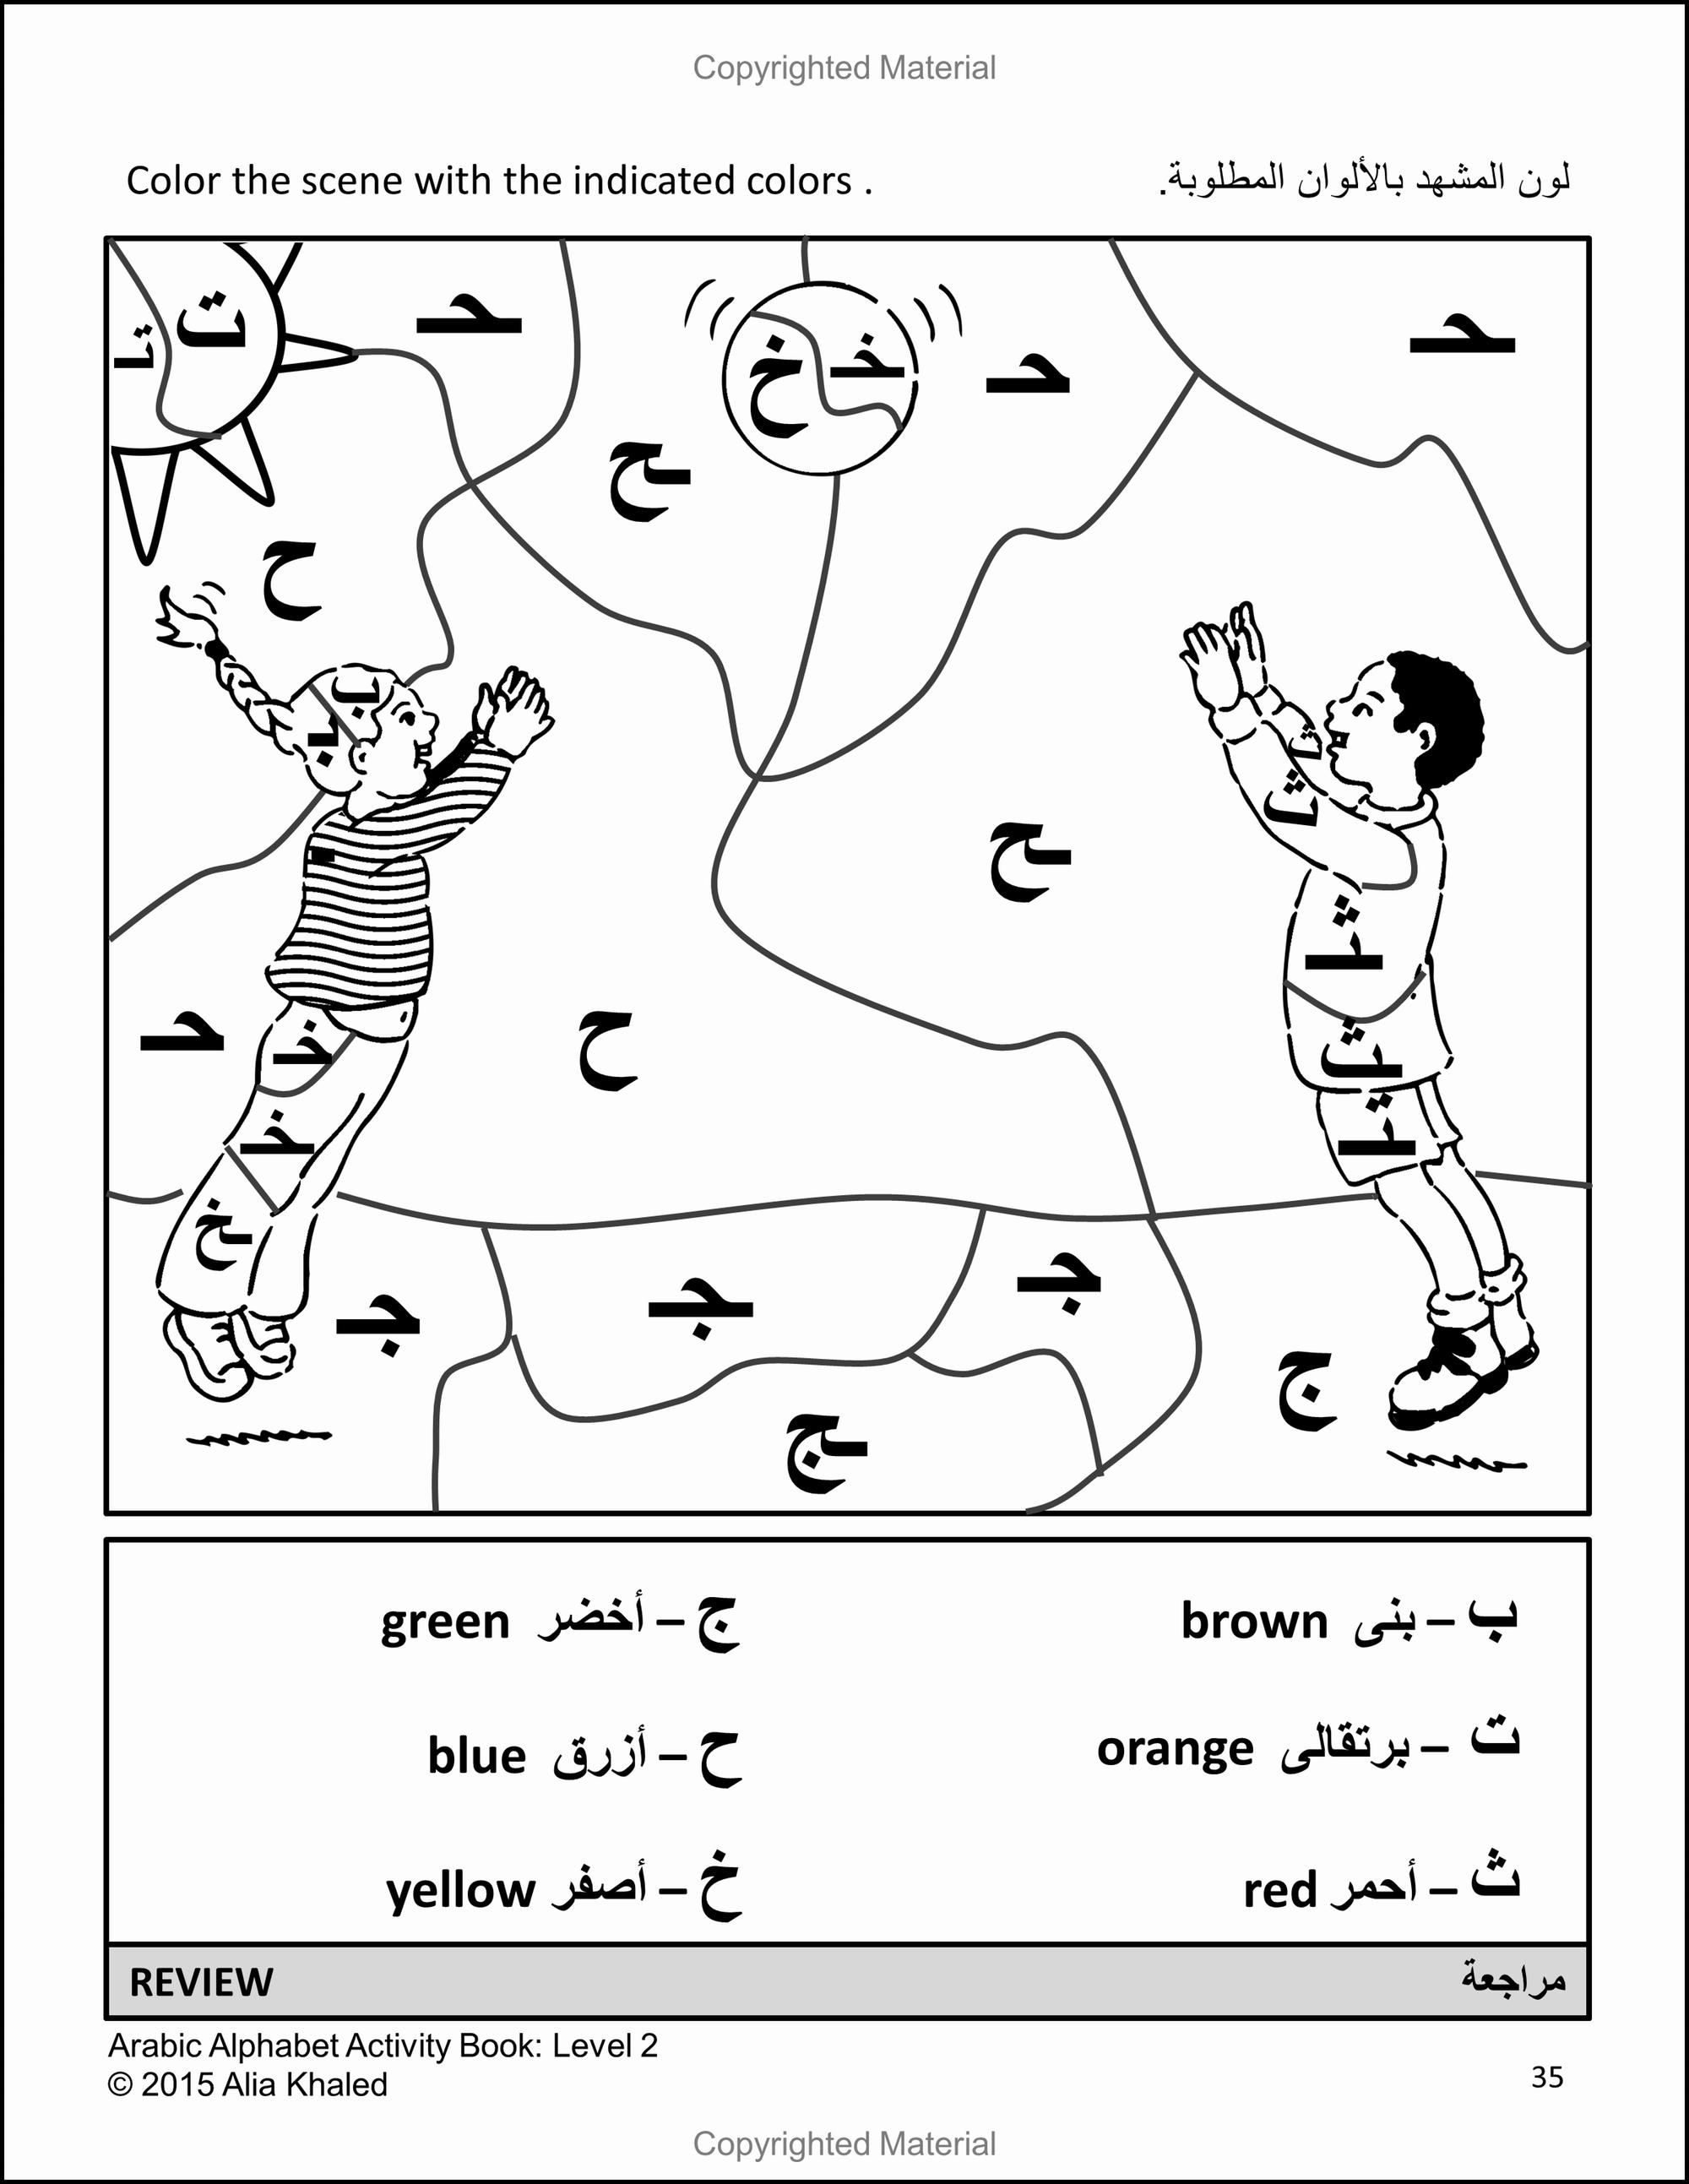 Image Of Arabic Alphabet Activity Book Level 2 Black